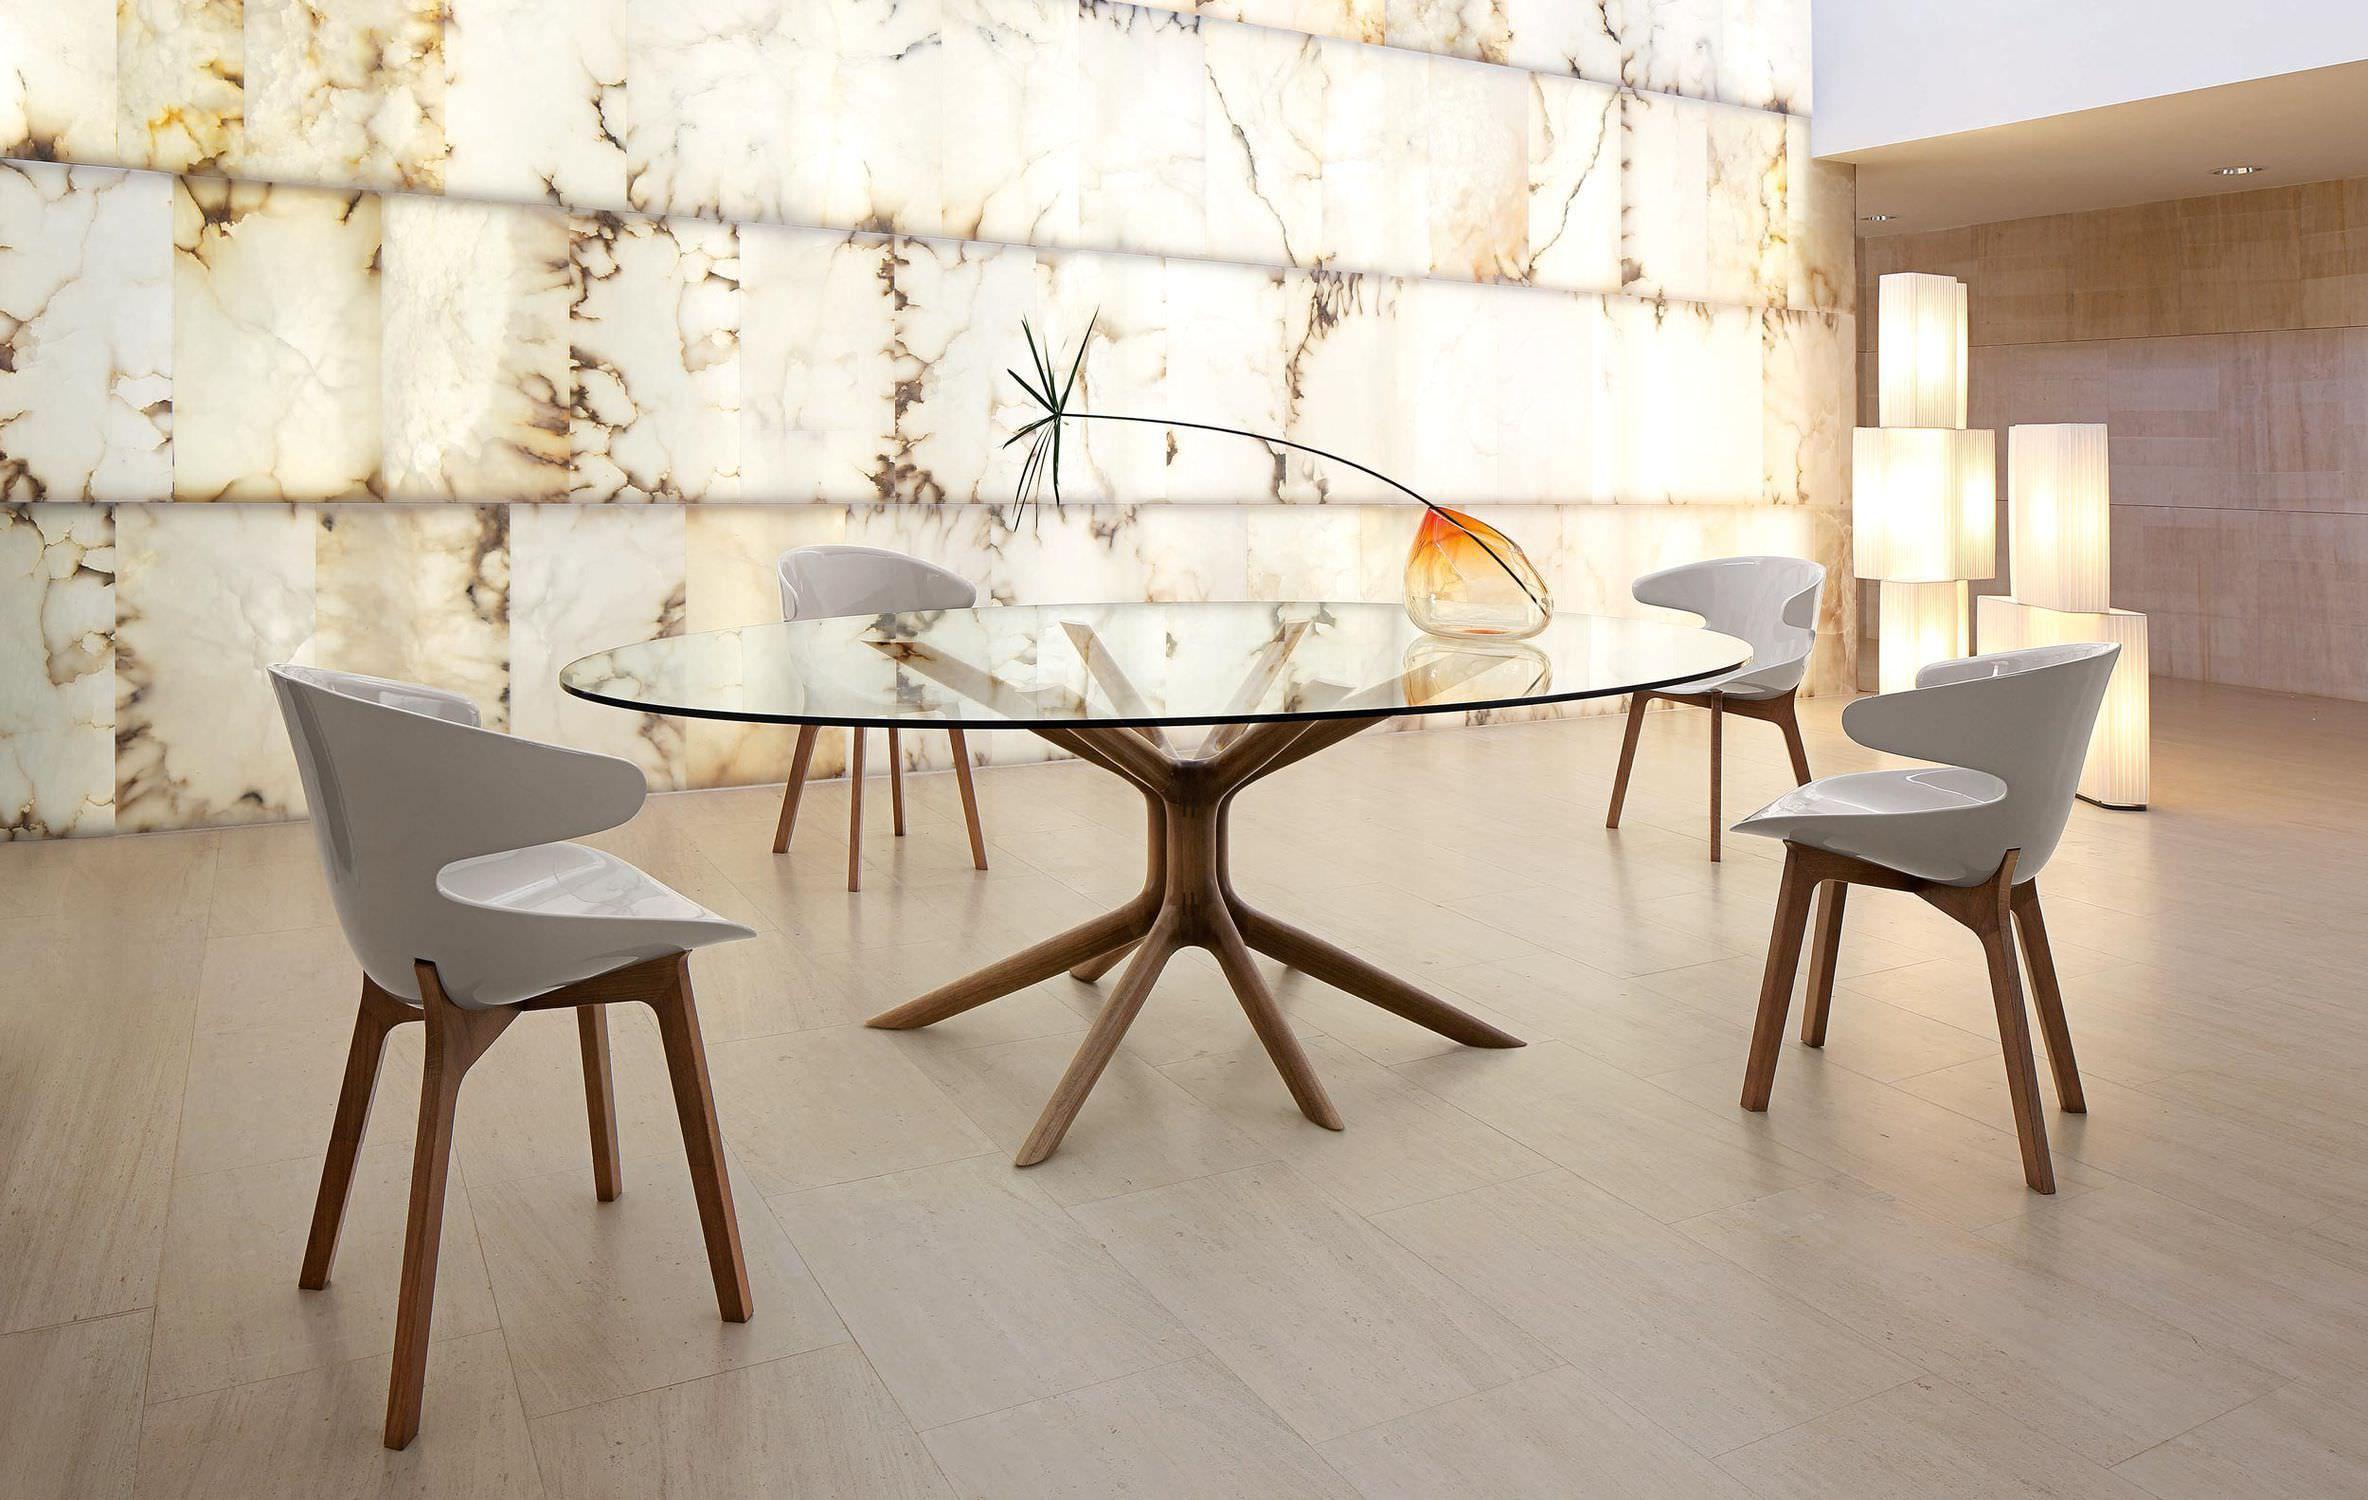 roche bobois - Google Search | furniture | Pinterest | Luxury ...